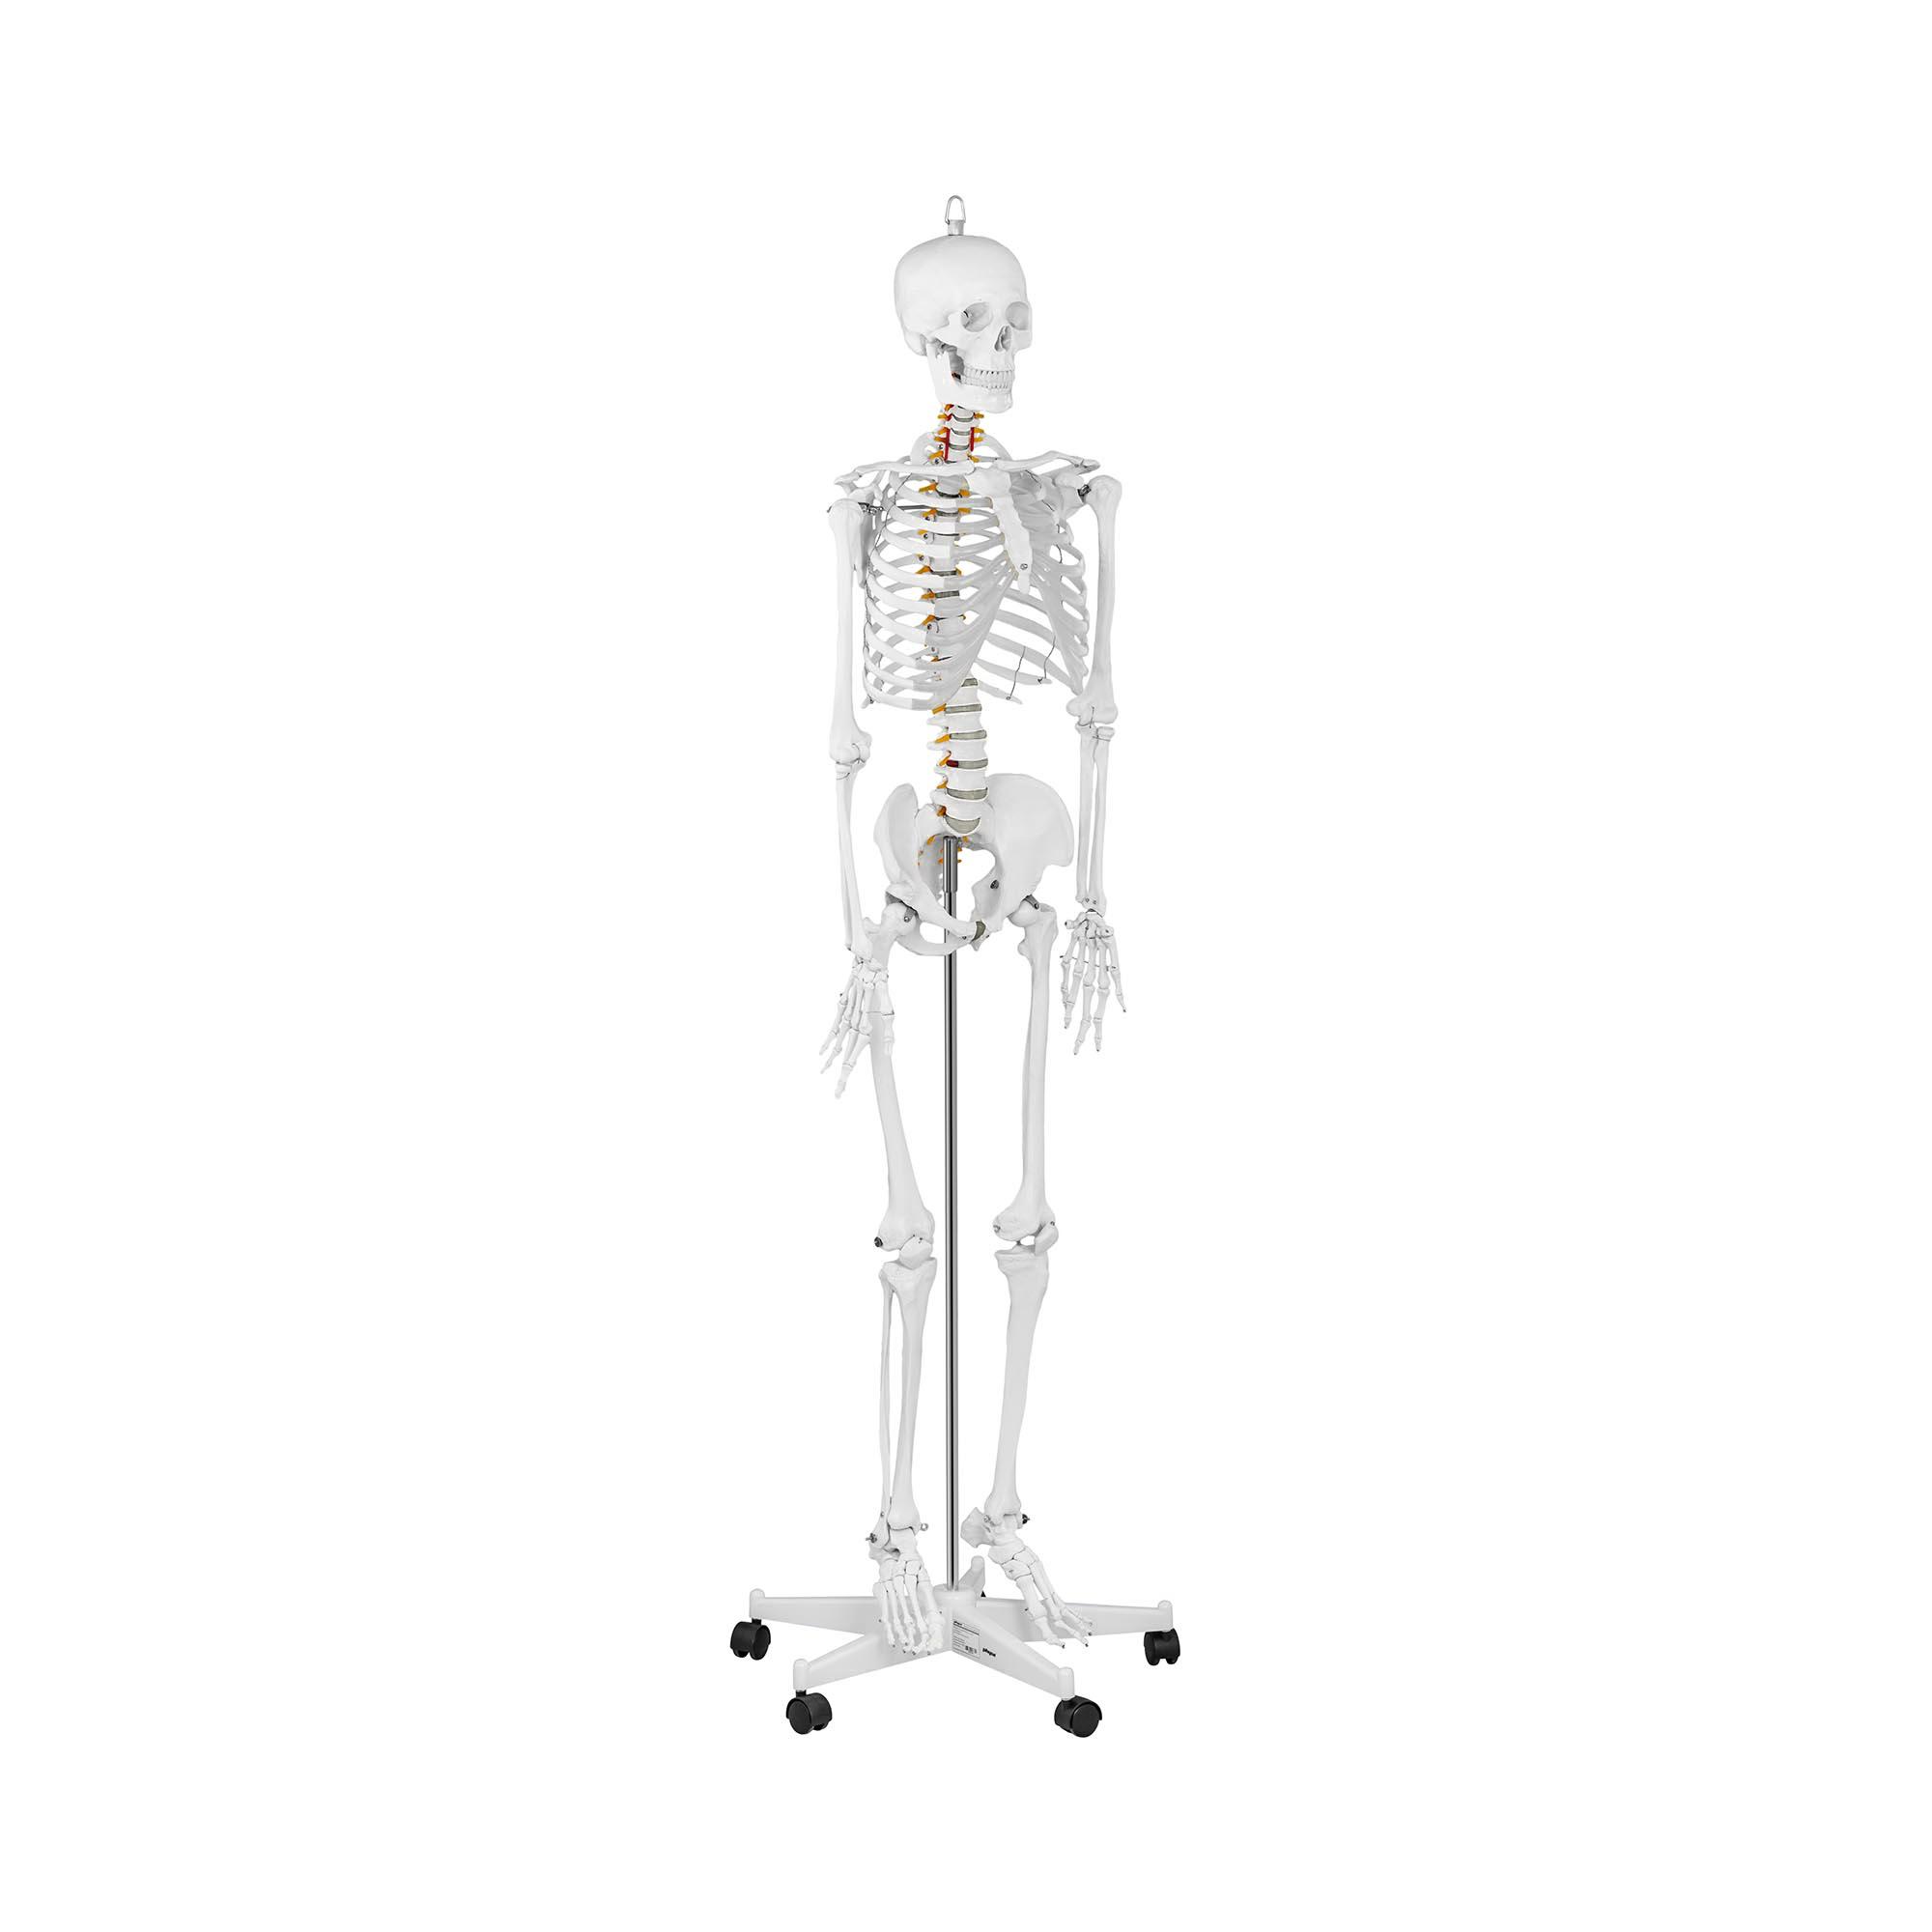 physa Skelett Modell PHY-SK-1 - lebensgroß 10040236